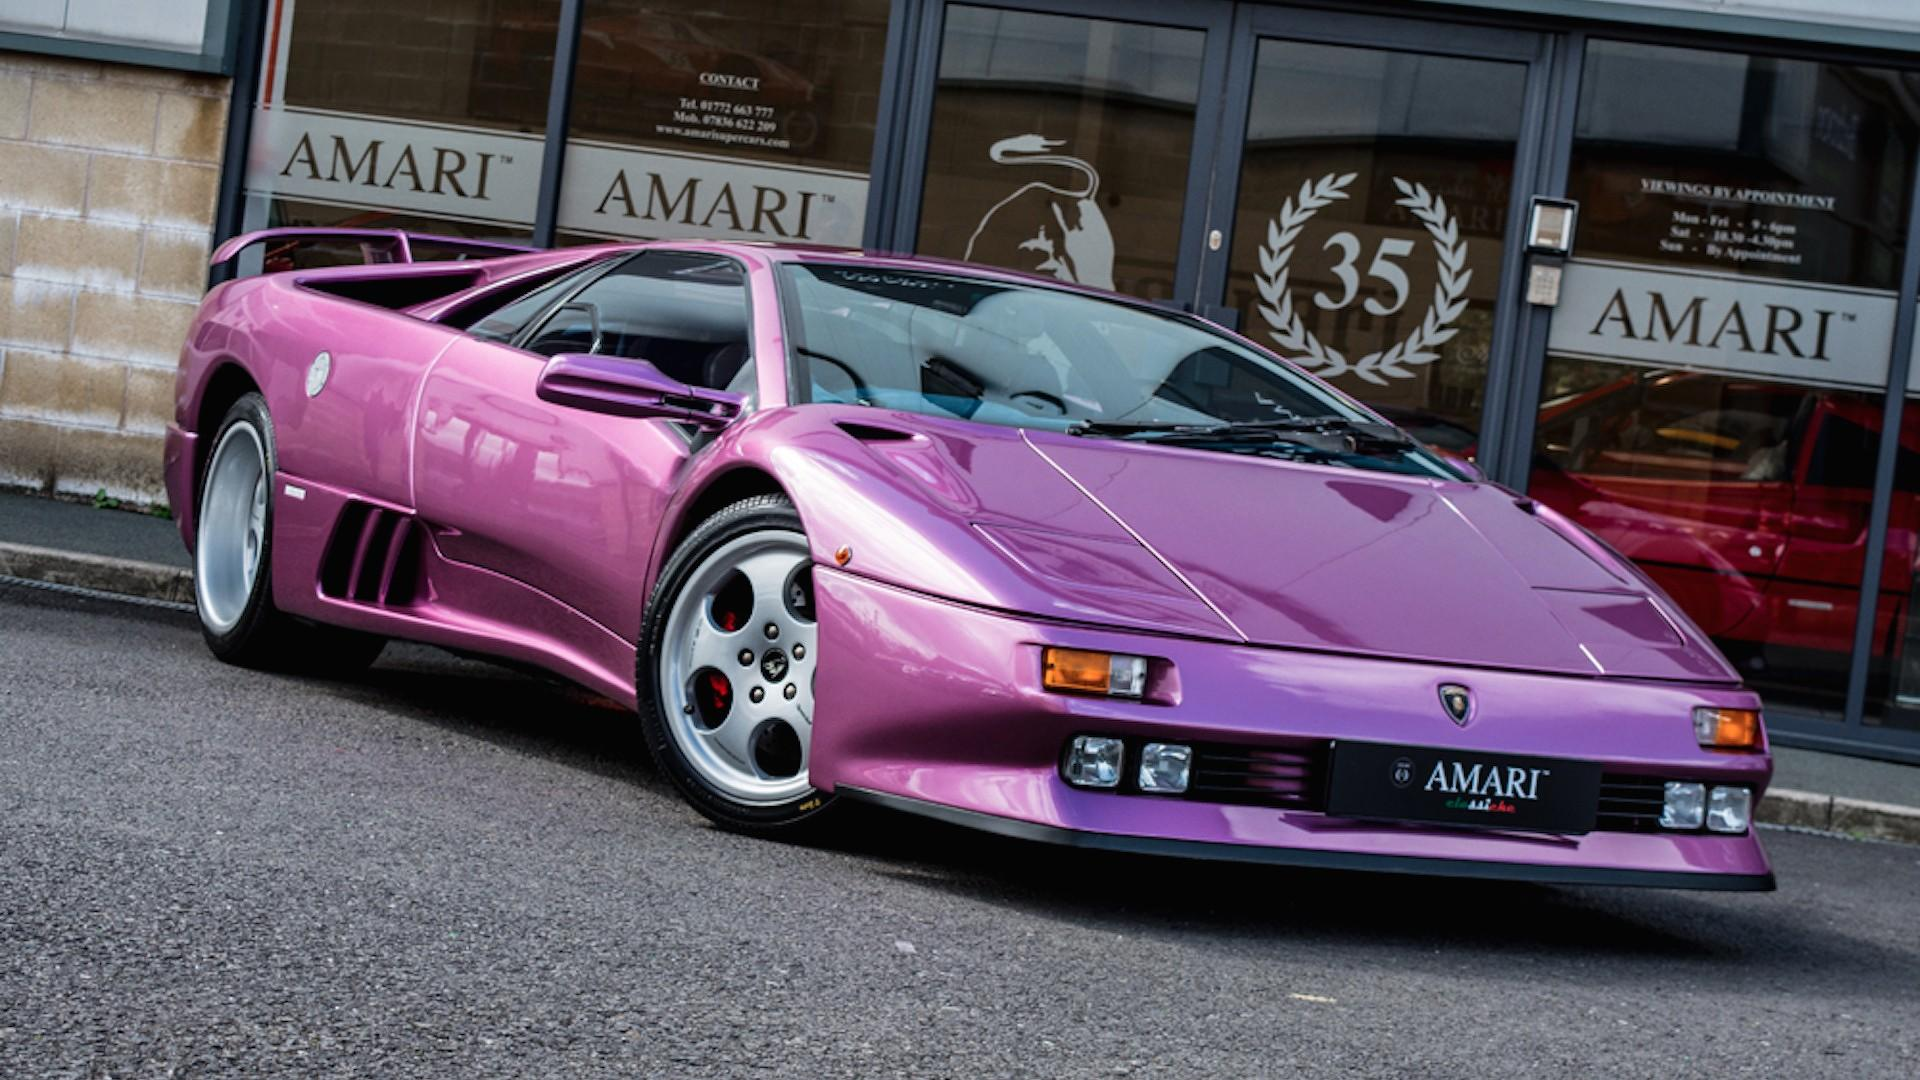 Lamborghini From Jamiroquai\u0027s Cosmic Girl Has Astronomical Price